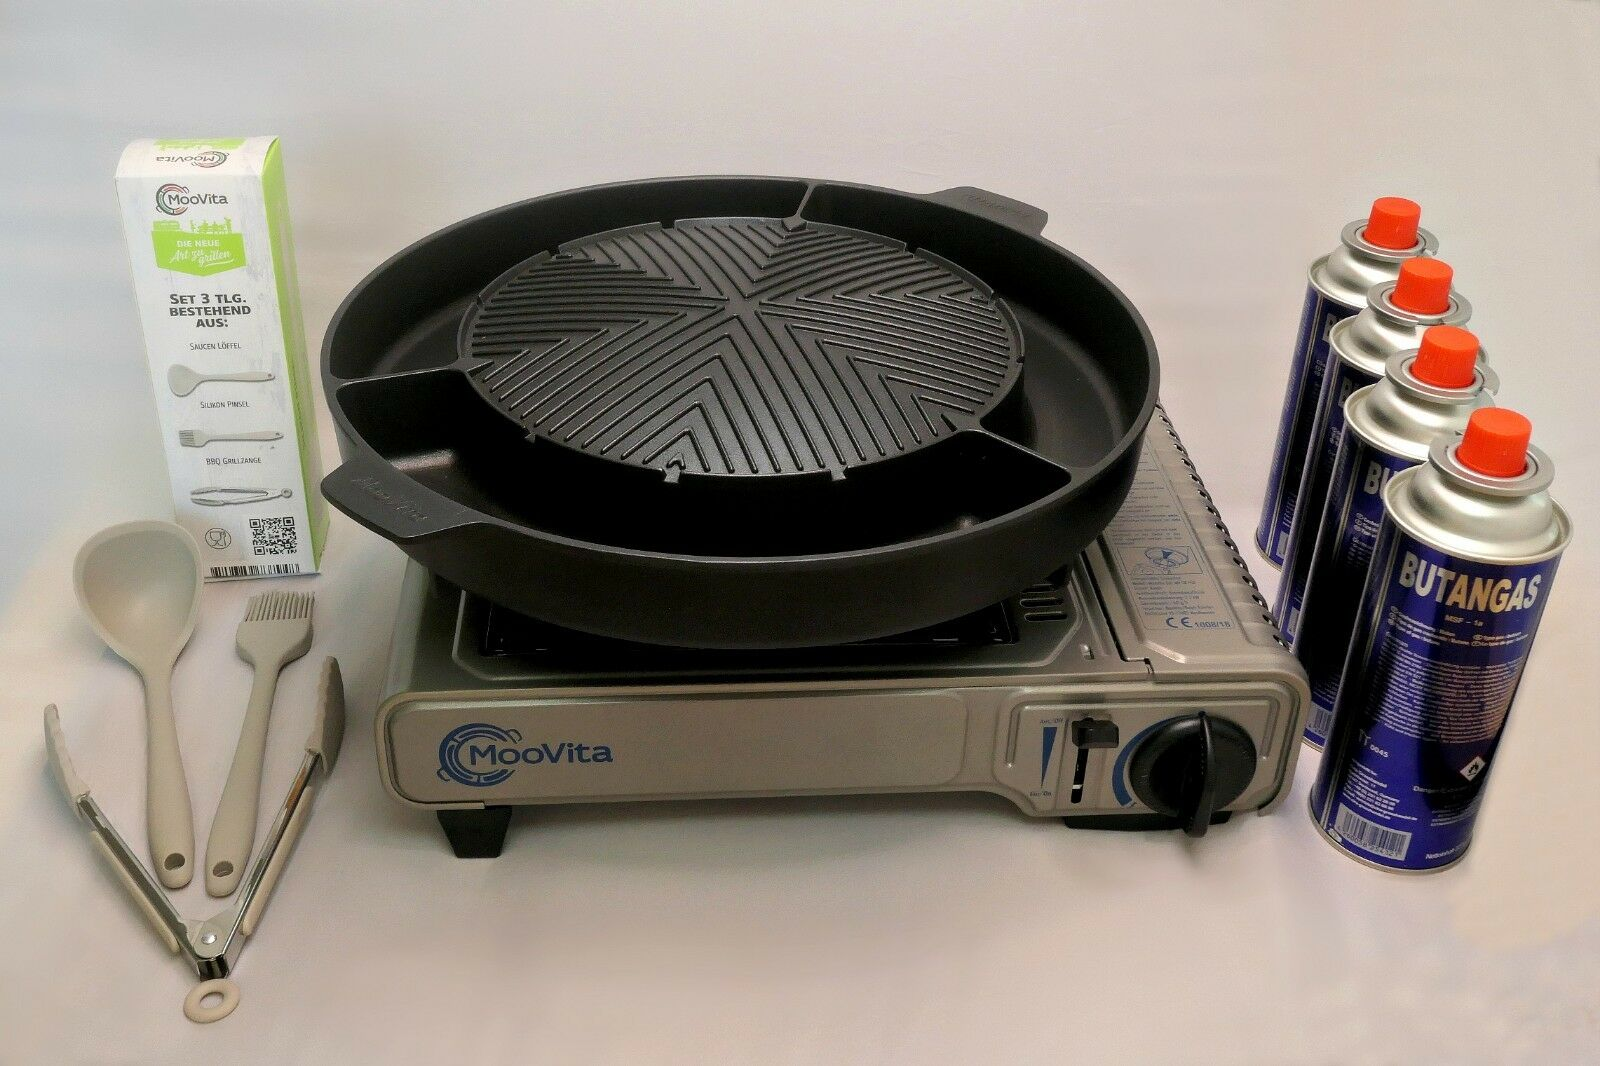 MooVita Grillplatte + Gaskocher mit FSD (Stopgas) + Silikon Set + Gaskartuschen